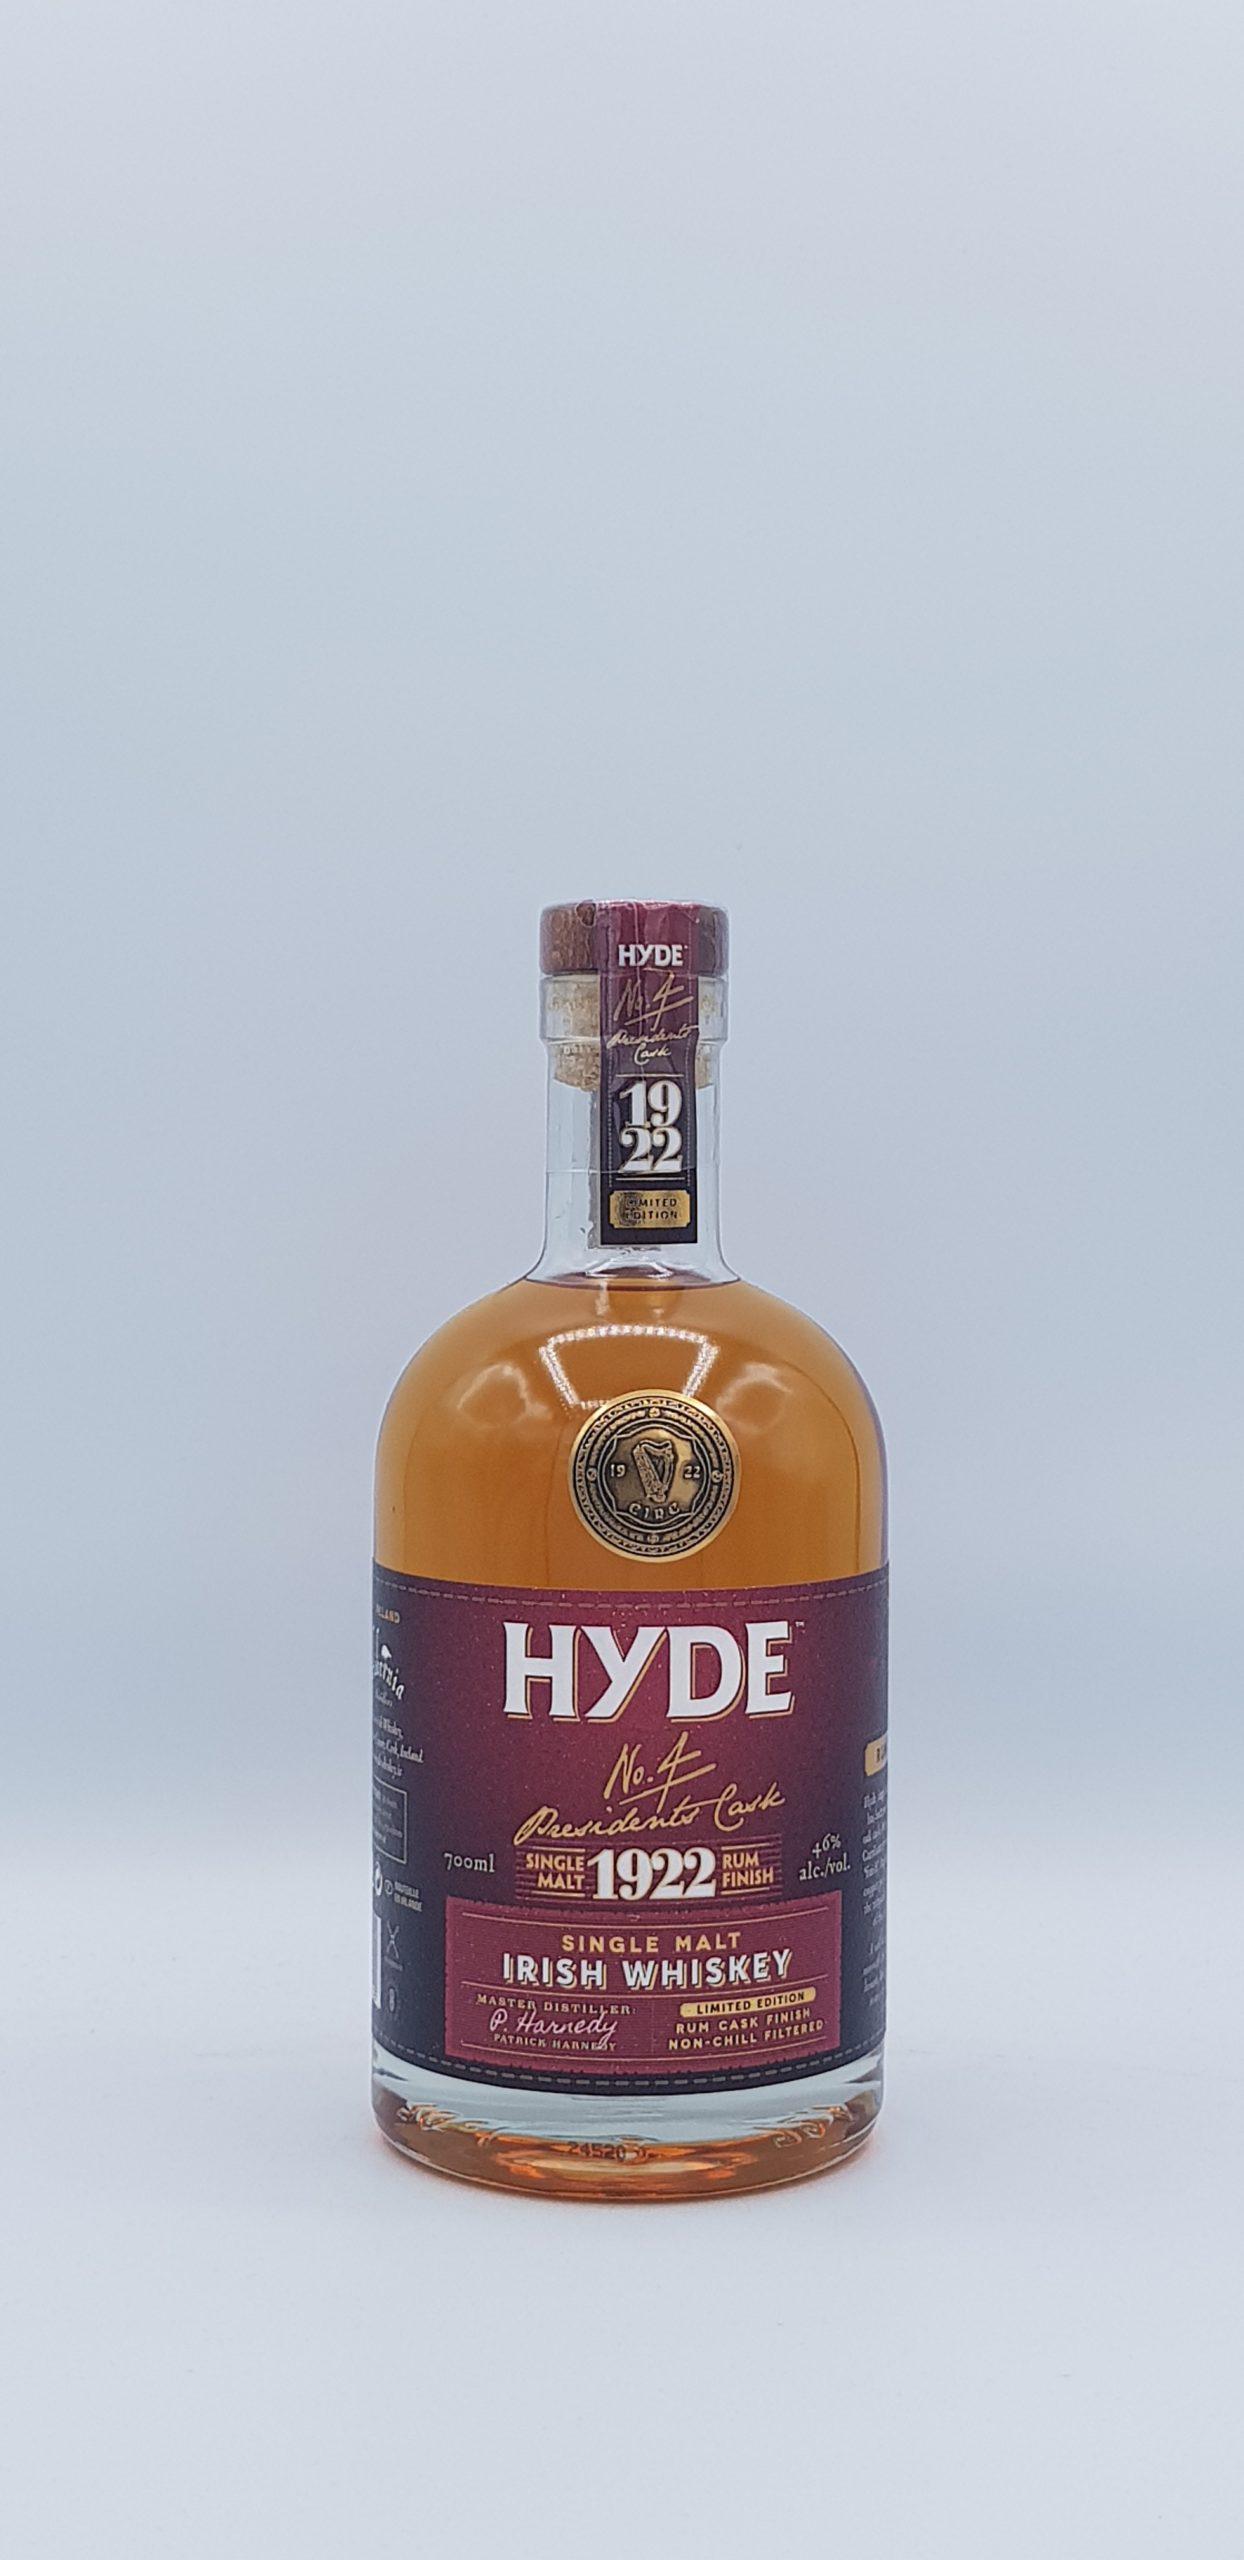 Hyde N°4 Single Malt 6 Rum Finish 46° 70cl